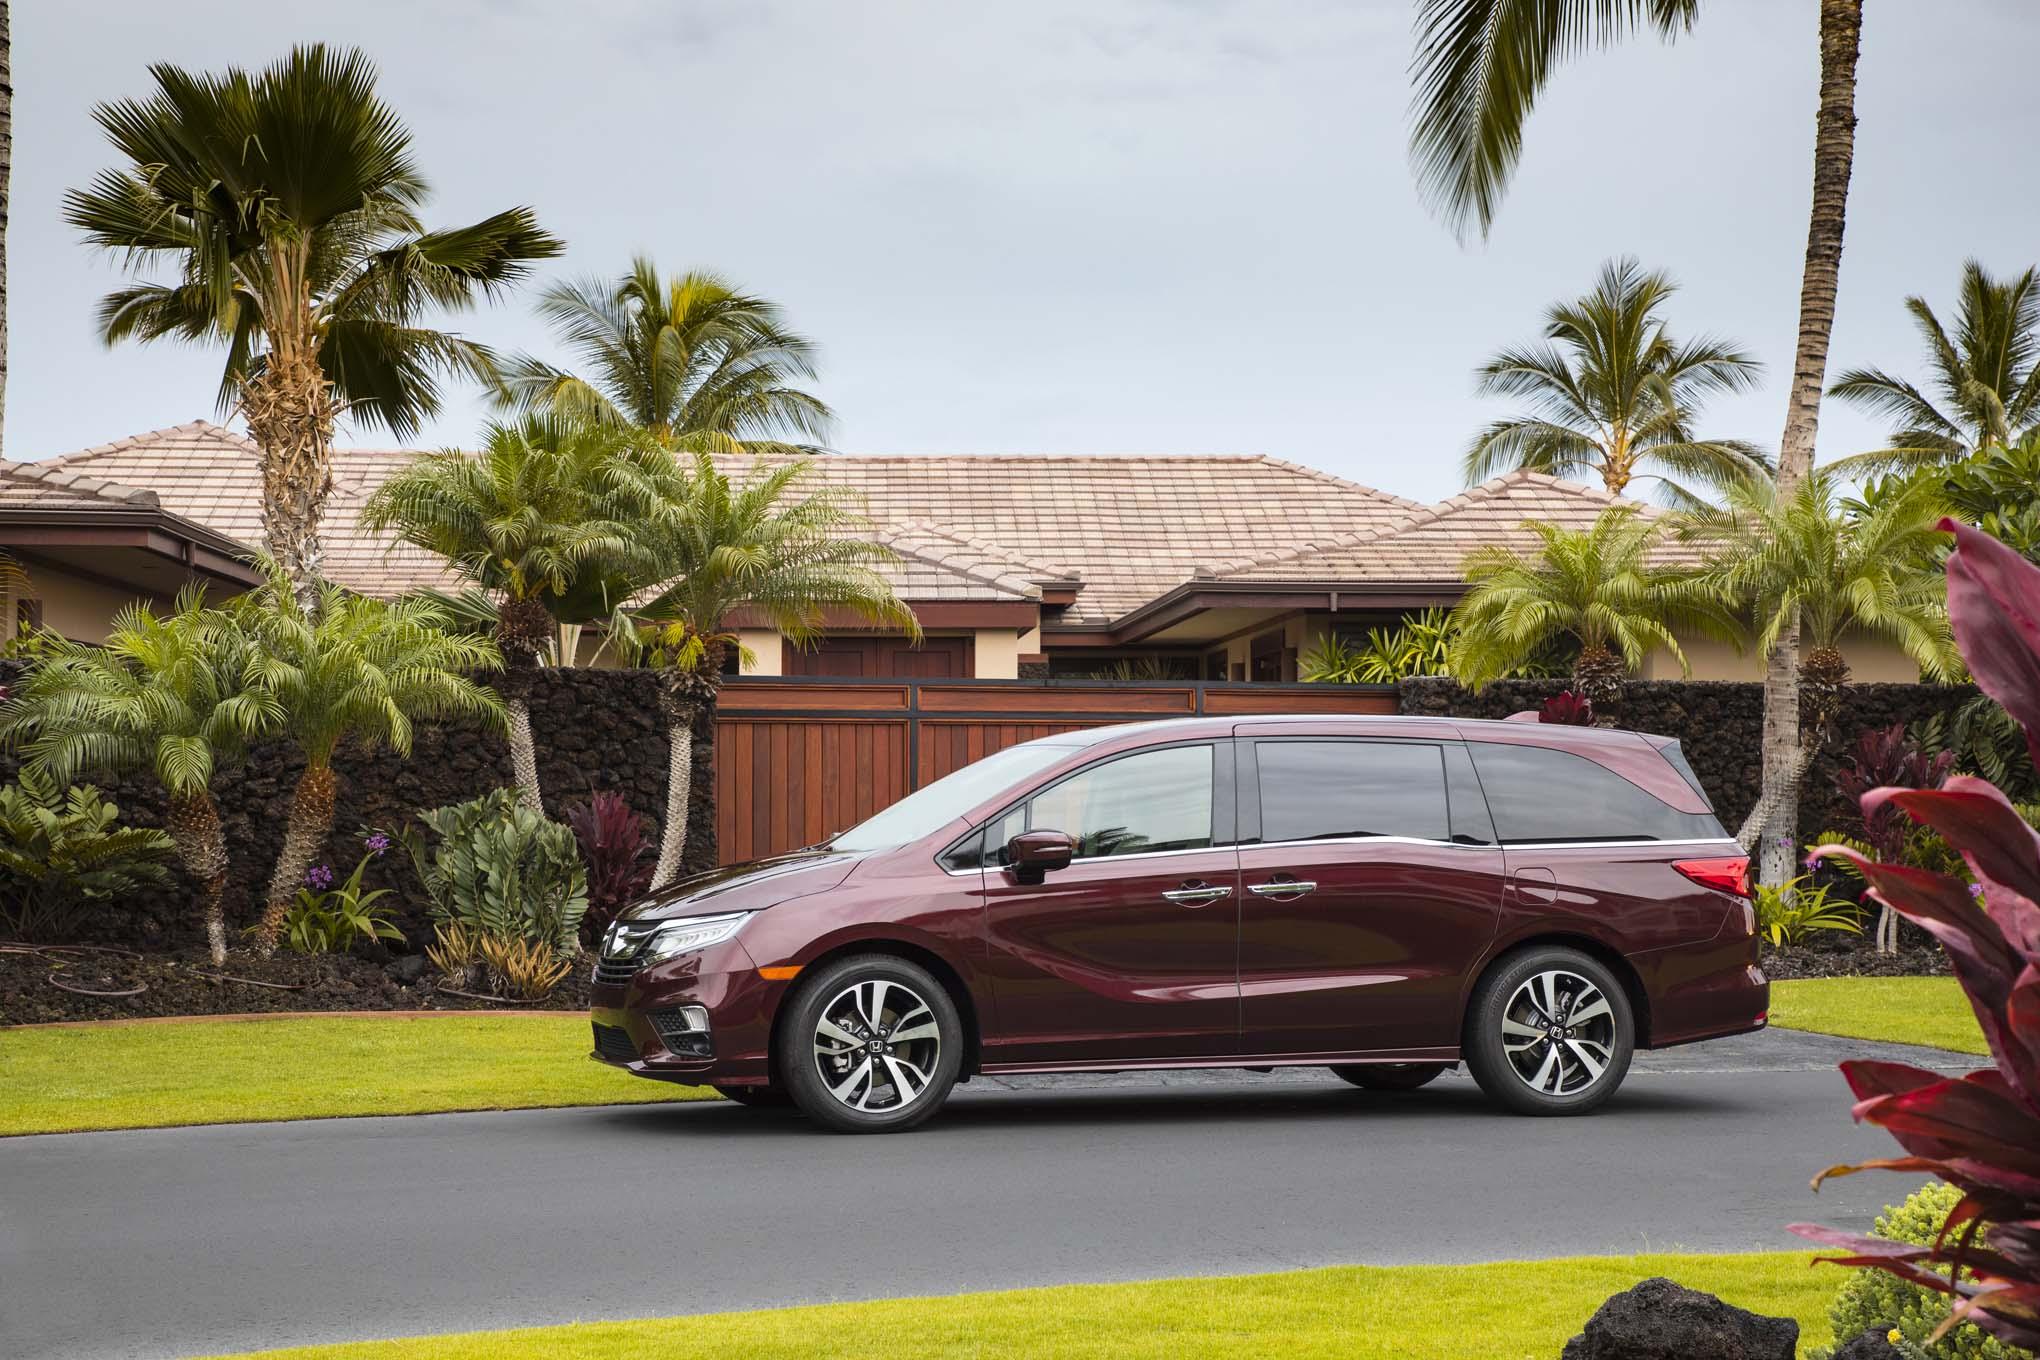 2018 Honda Odyssey Side Profile 06